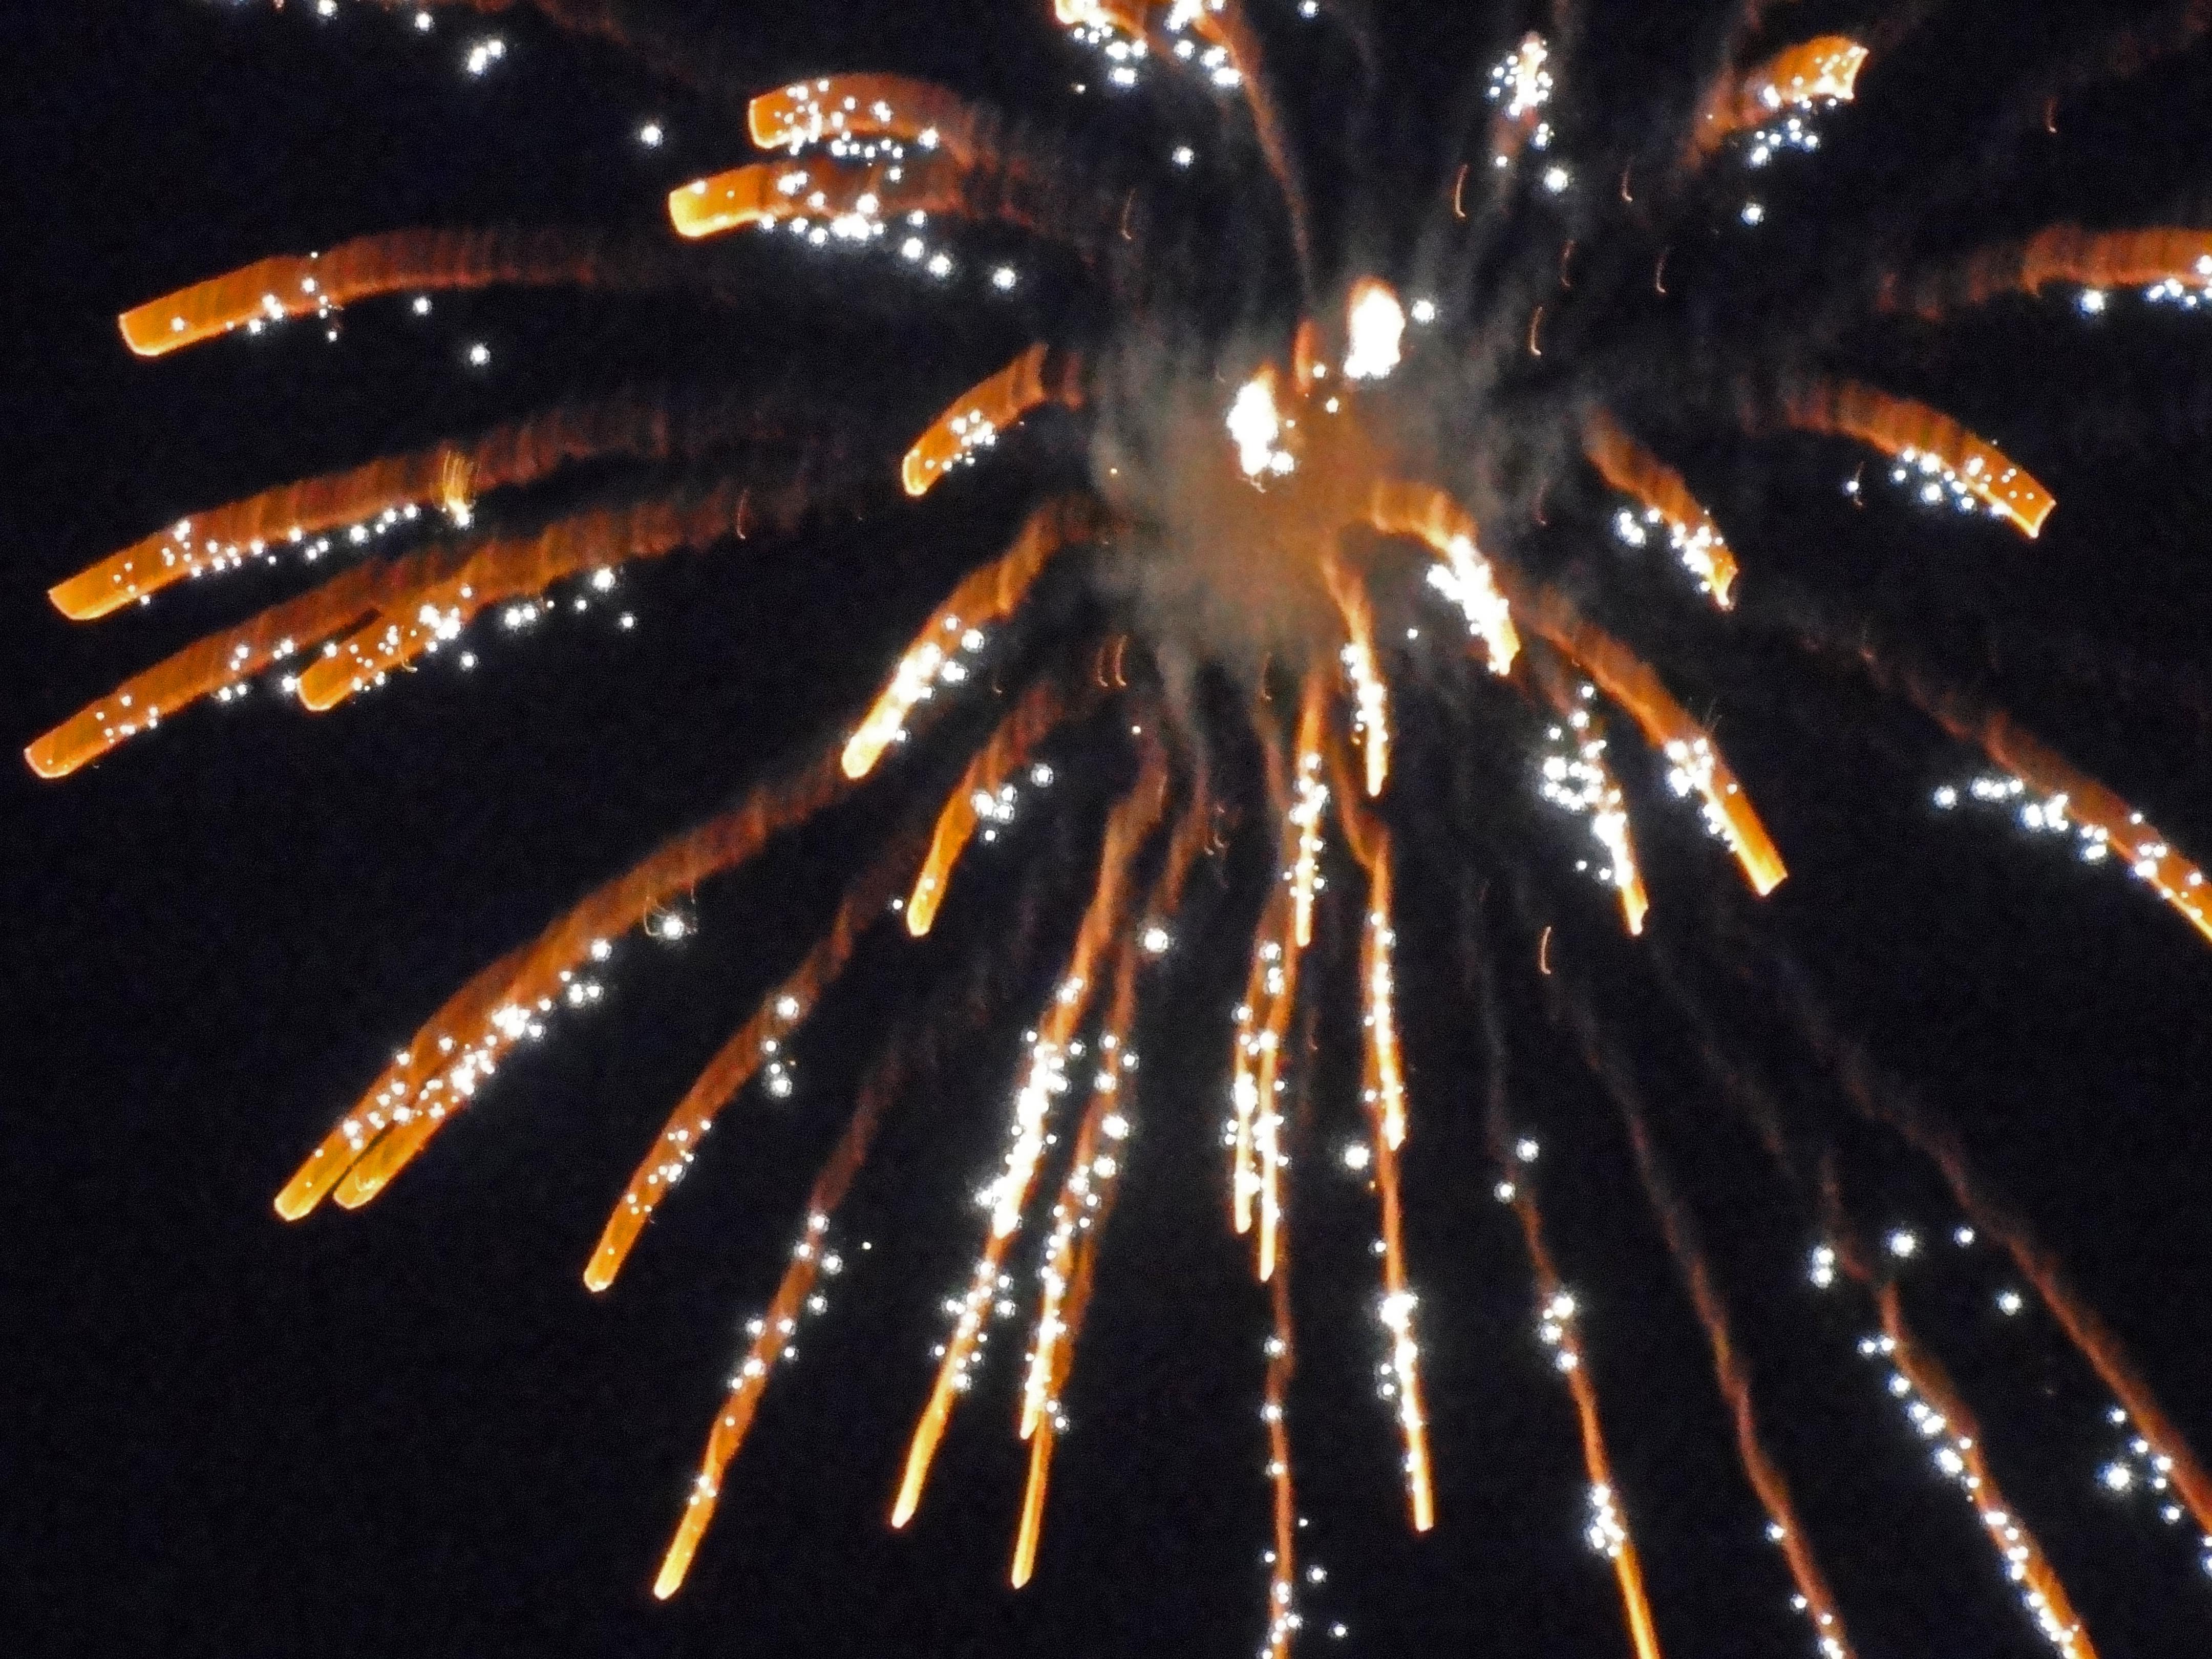 File:Firework with smoke (6529994019).jpg - Wikimedia Commons